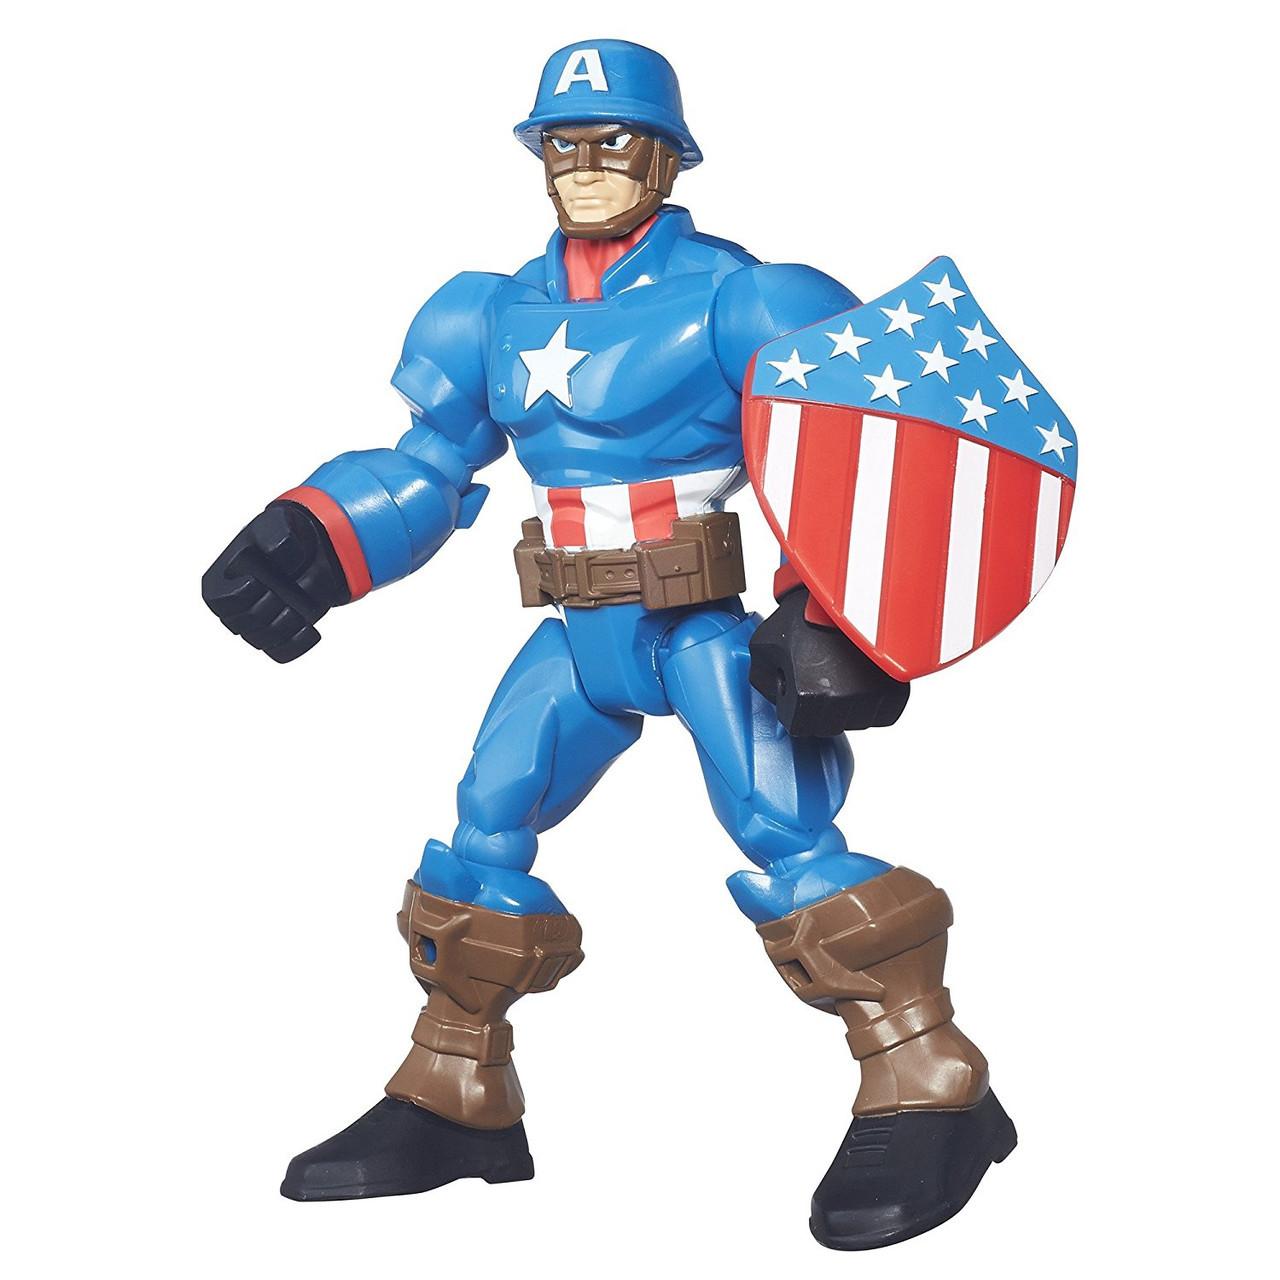 Разборная фигурка супер-героя Hasbro Капитан Америка 21 см (36-143408)